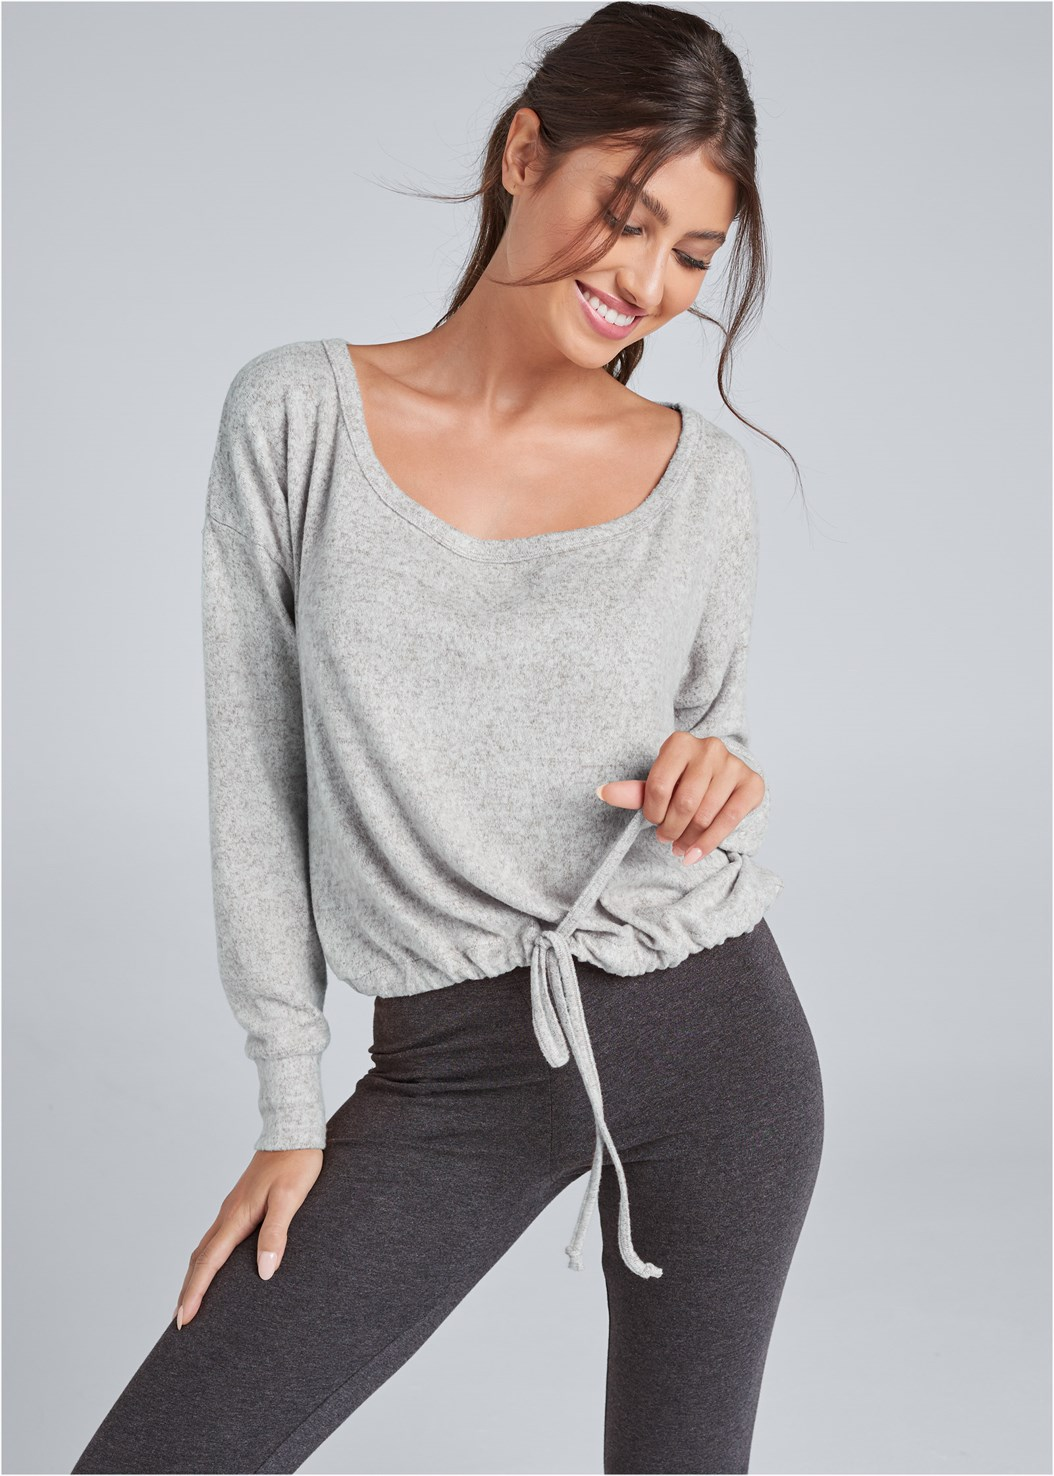 Cozy Off Shoulder Hacci Lounge Top,Basic Leggings